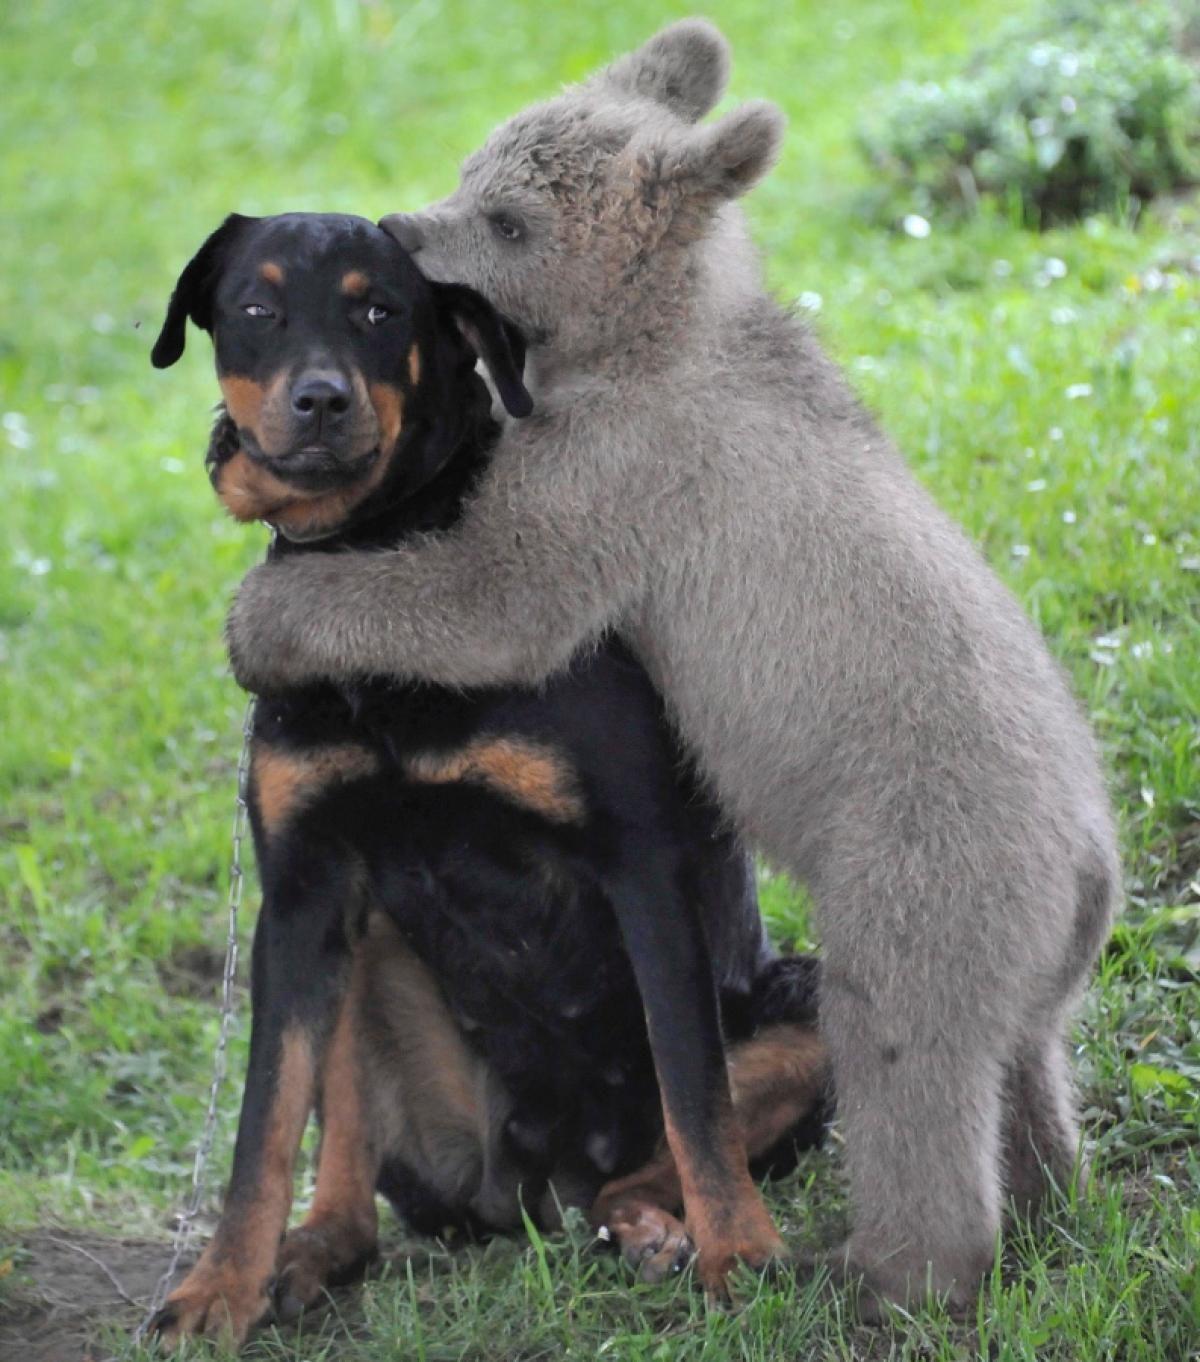 dog and bear - photos - animal odd couples | bear hugs, dog and odd